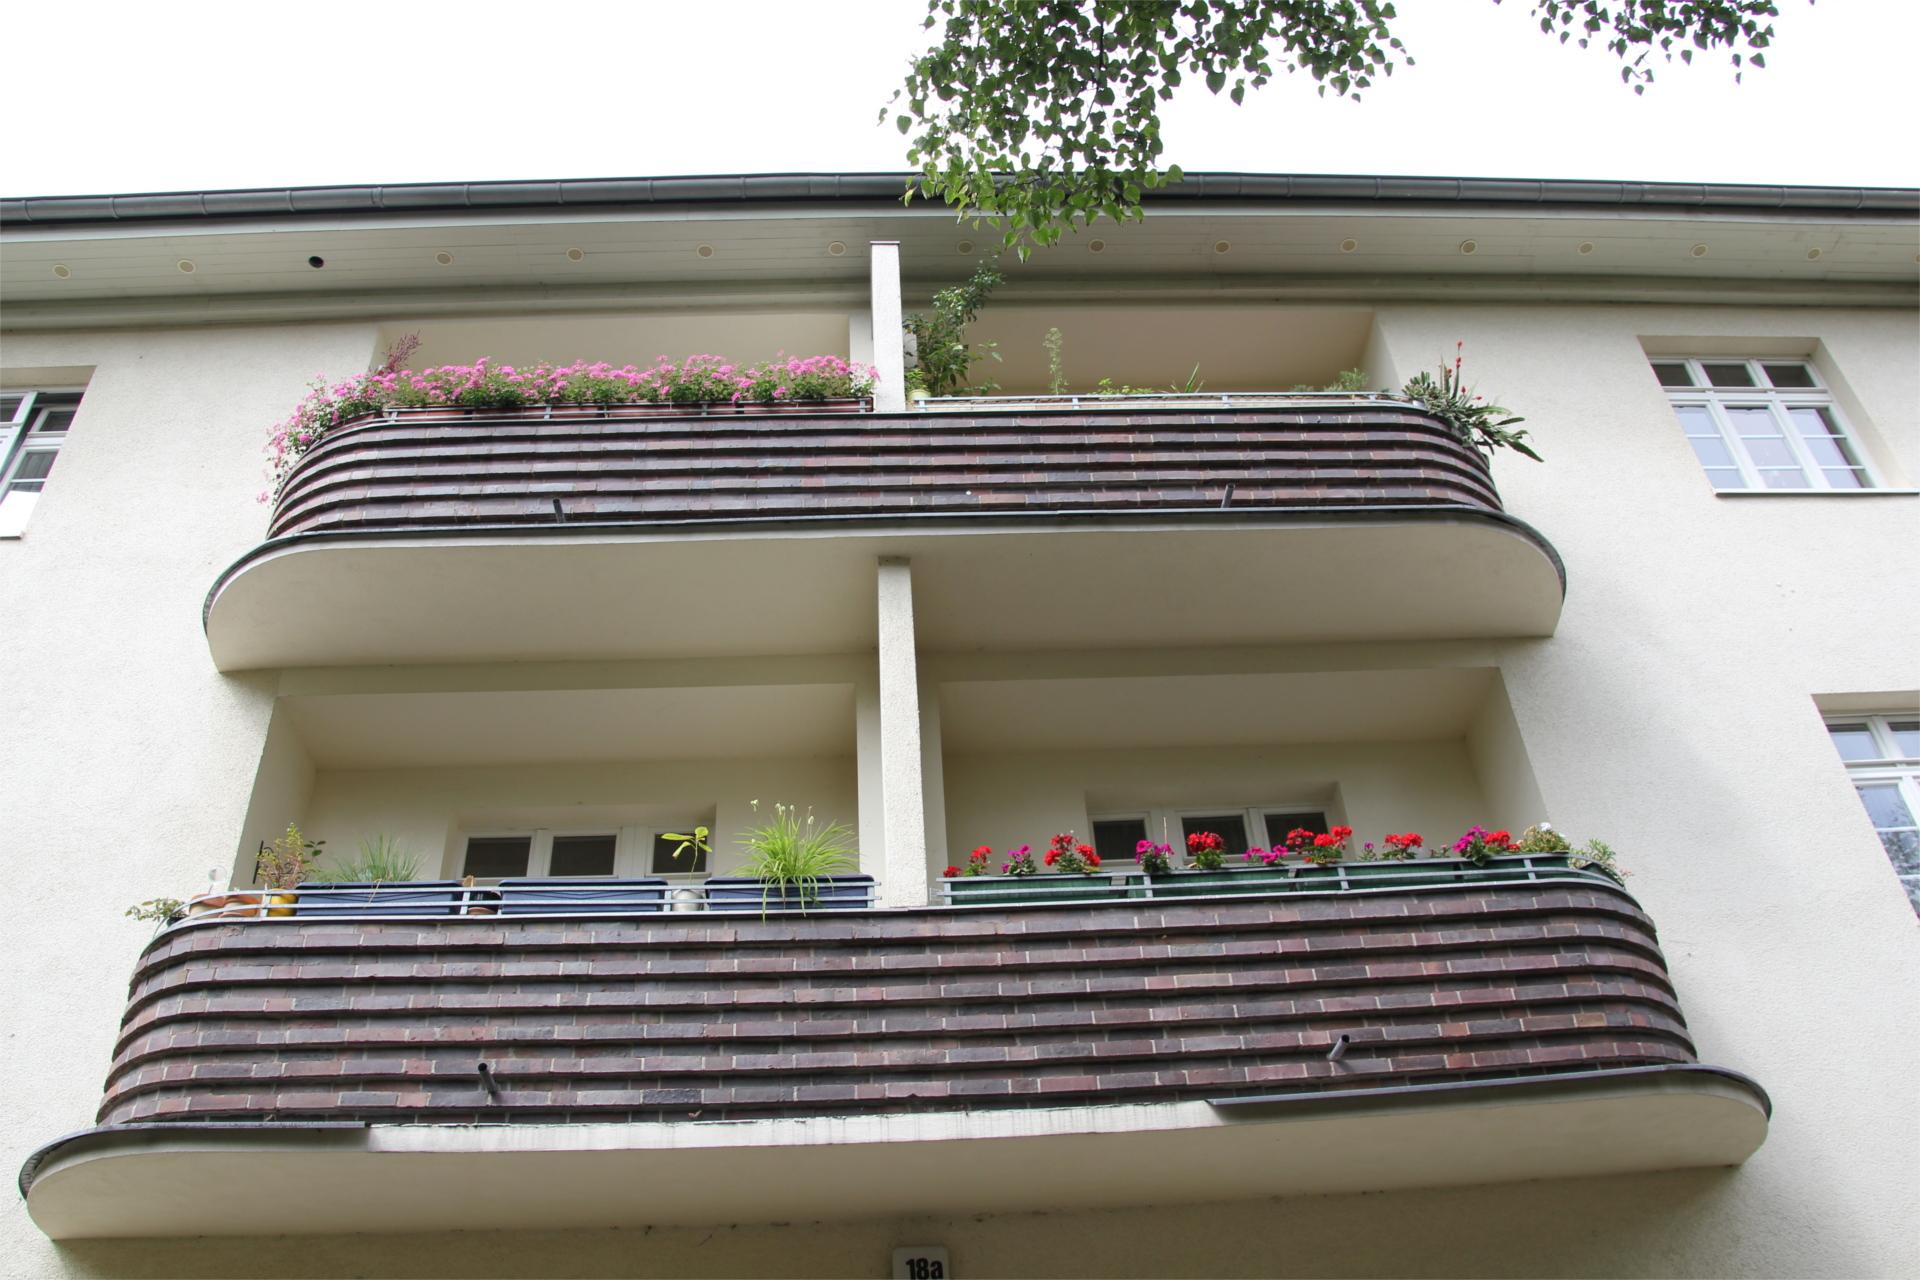 Roedernstraße-18a-1_small